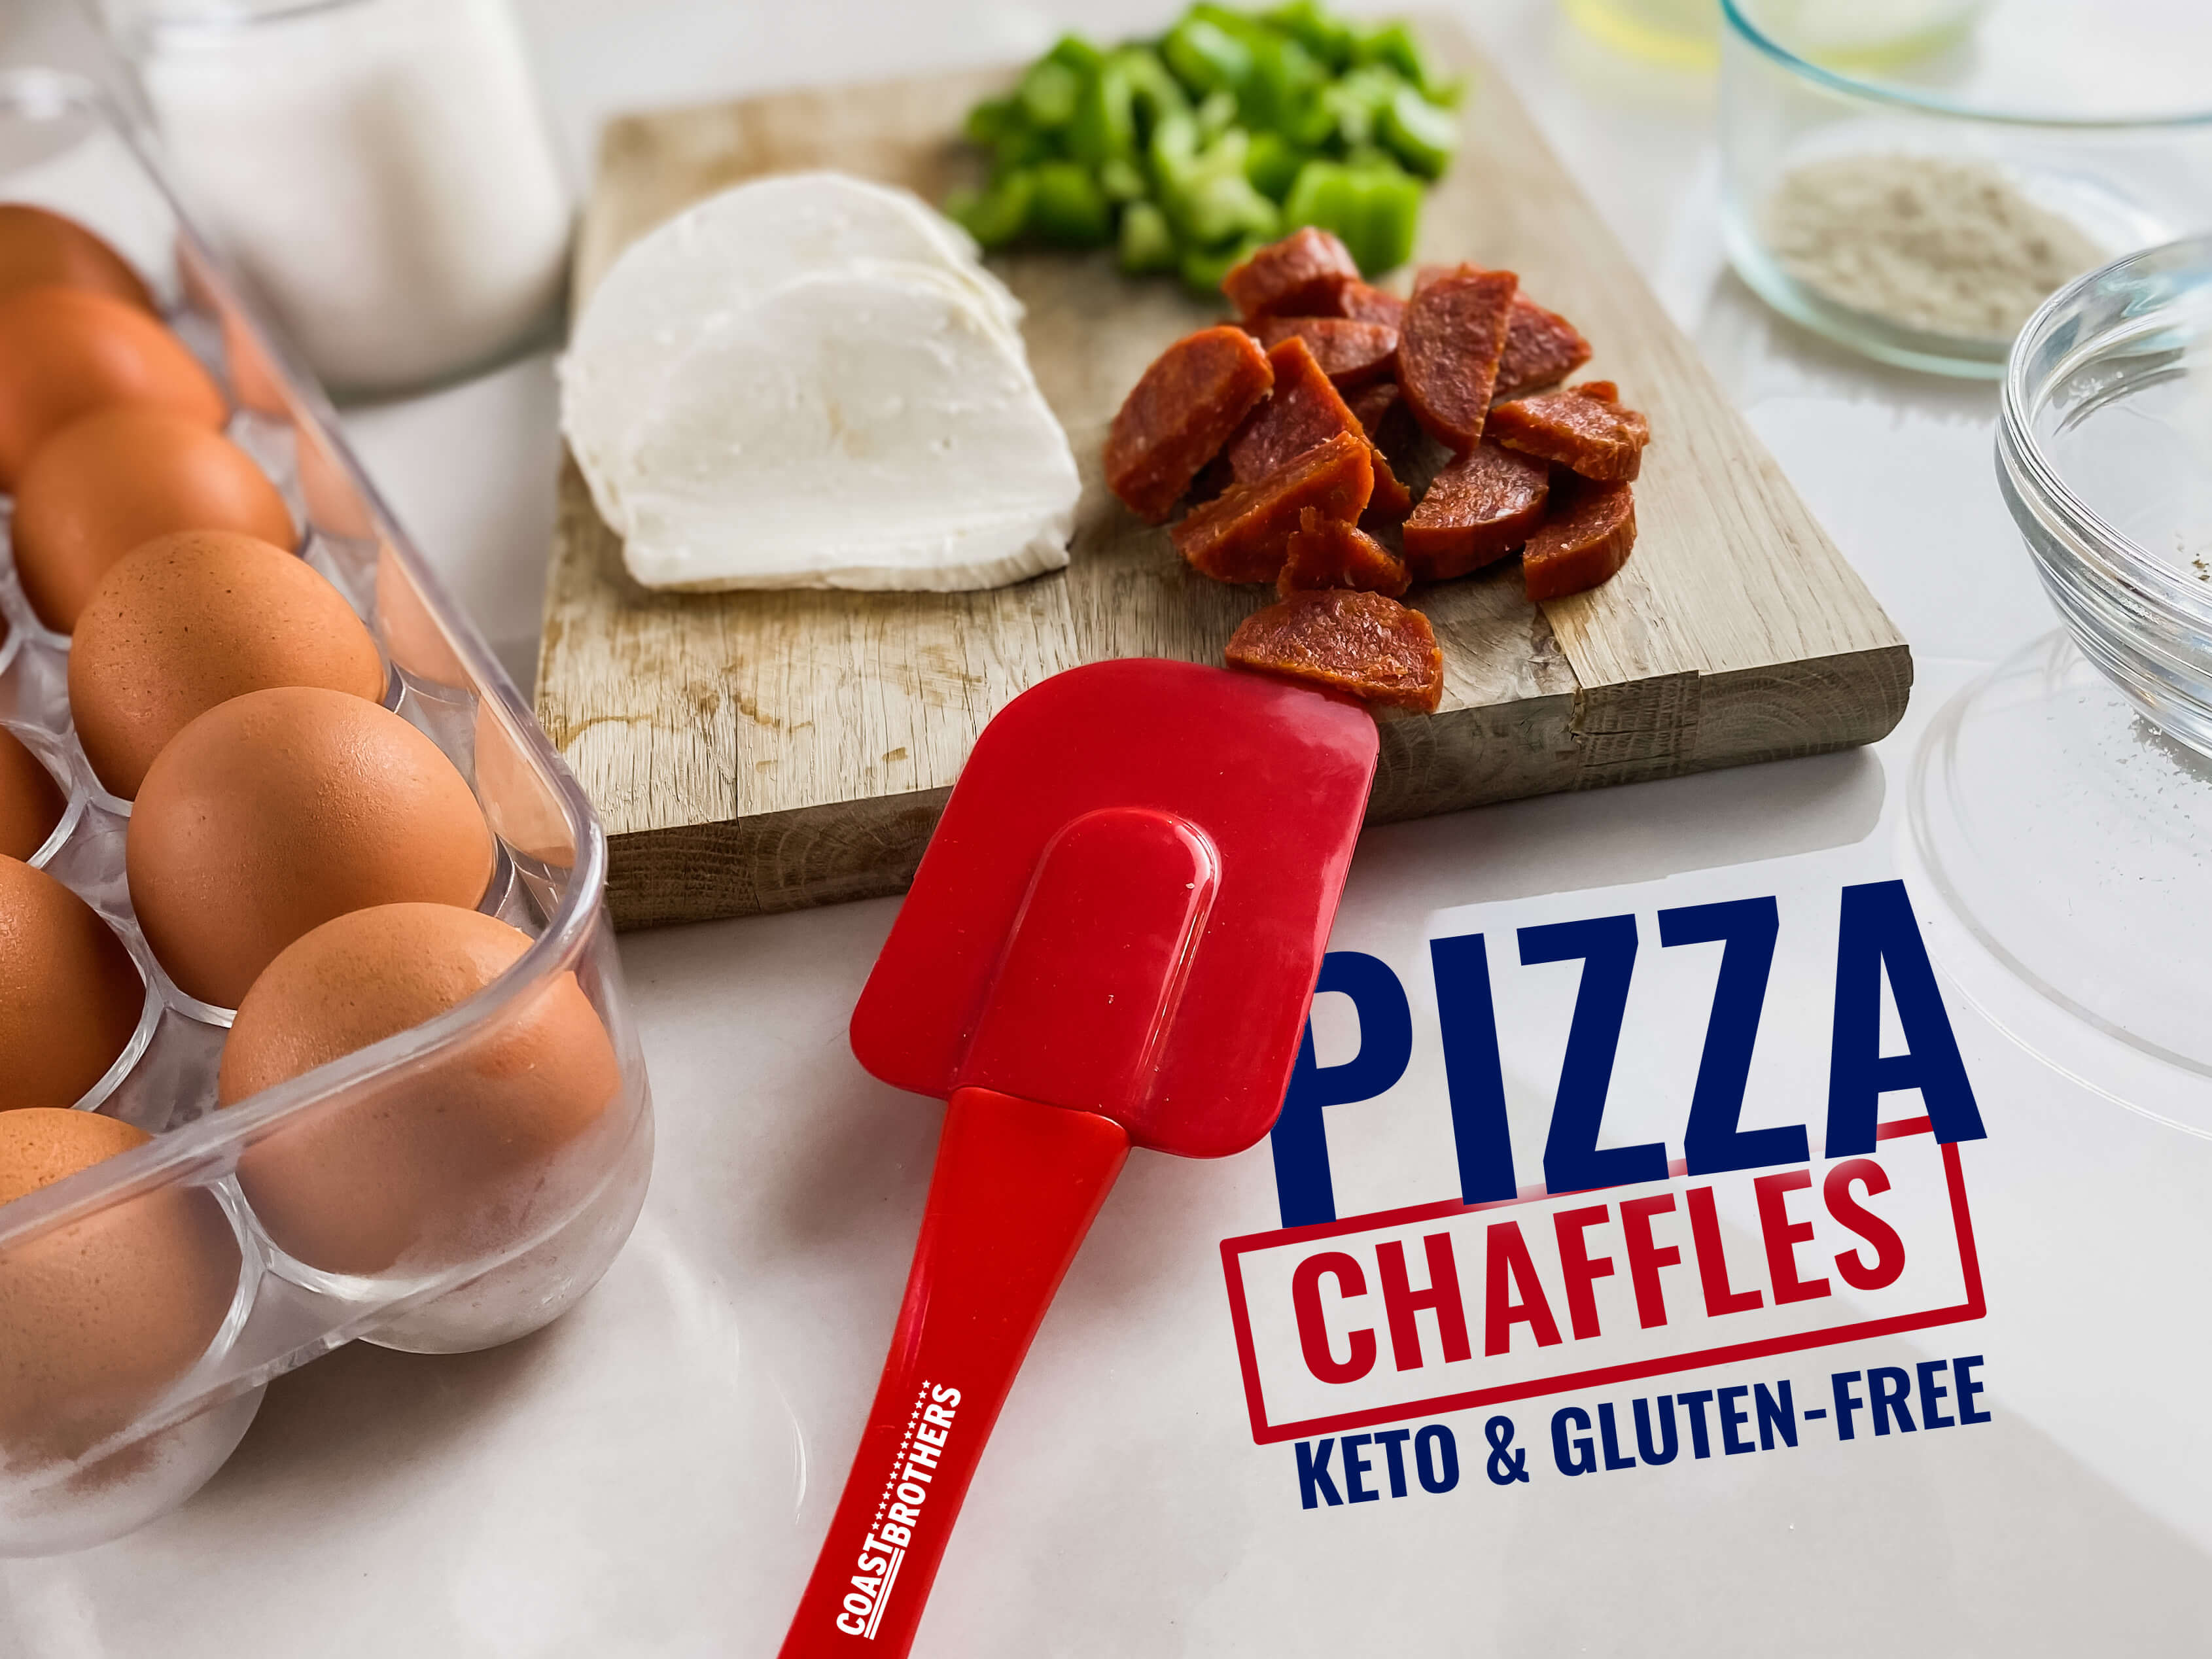 pizza-chaffles-recipe-coast-brothers-3.jpg